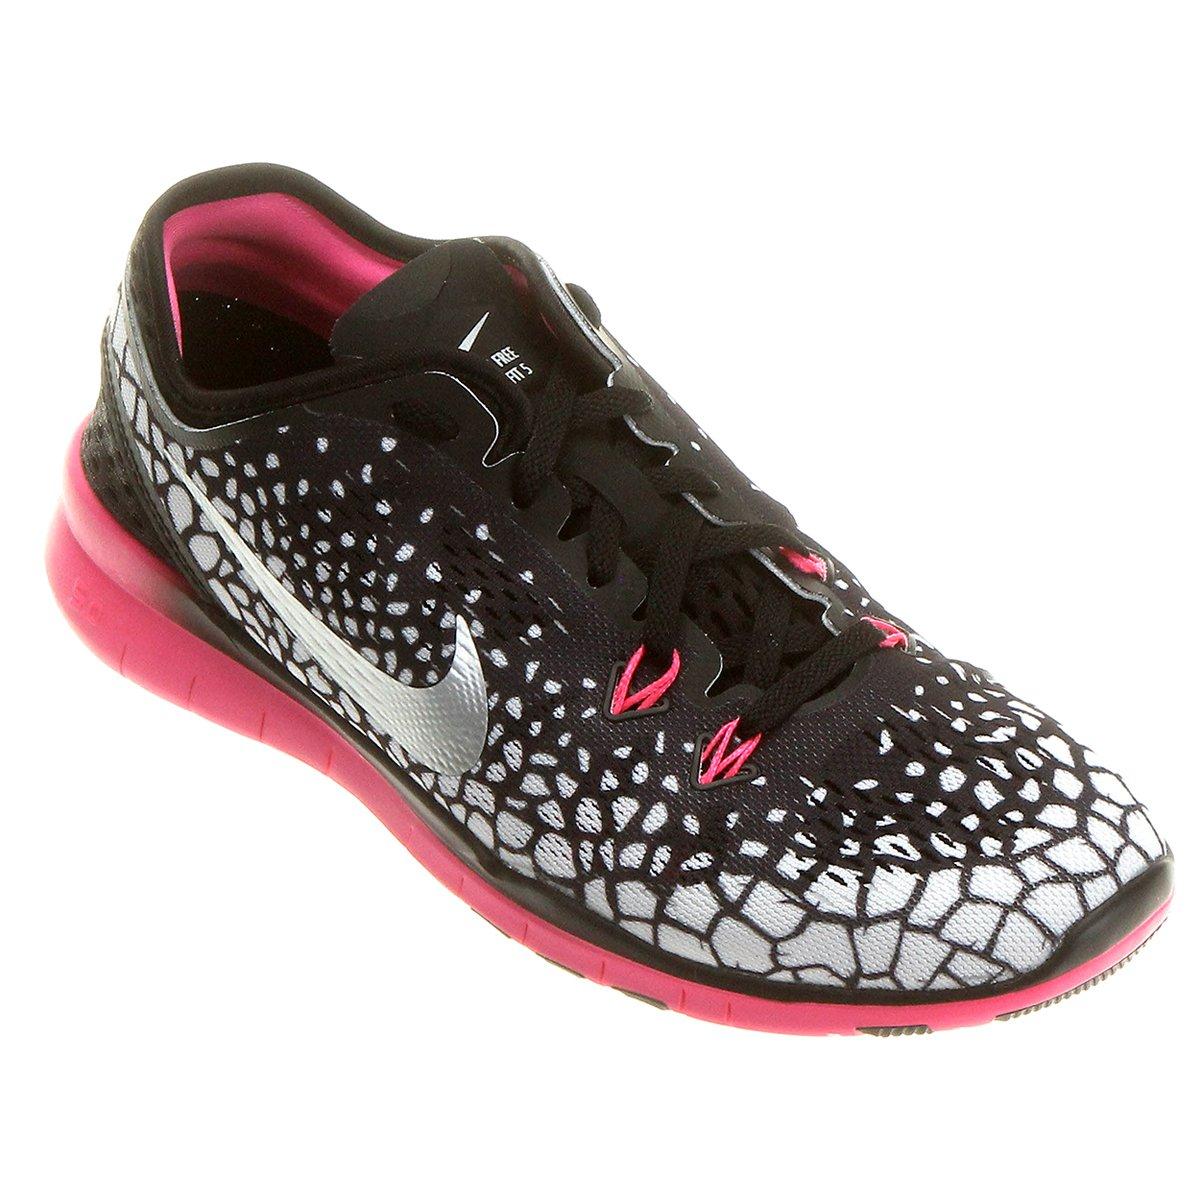 5c384261ab9 Tênis Nike Free 5.0 TR Fit 5 Feminino - Compre Agora